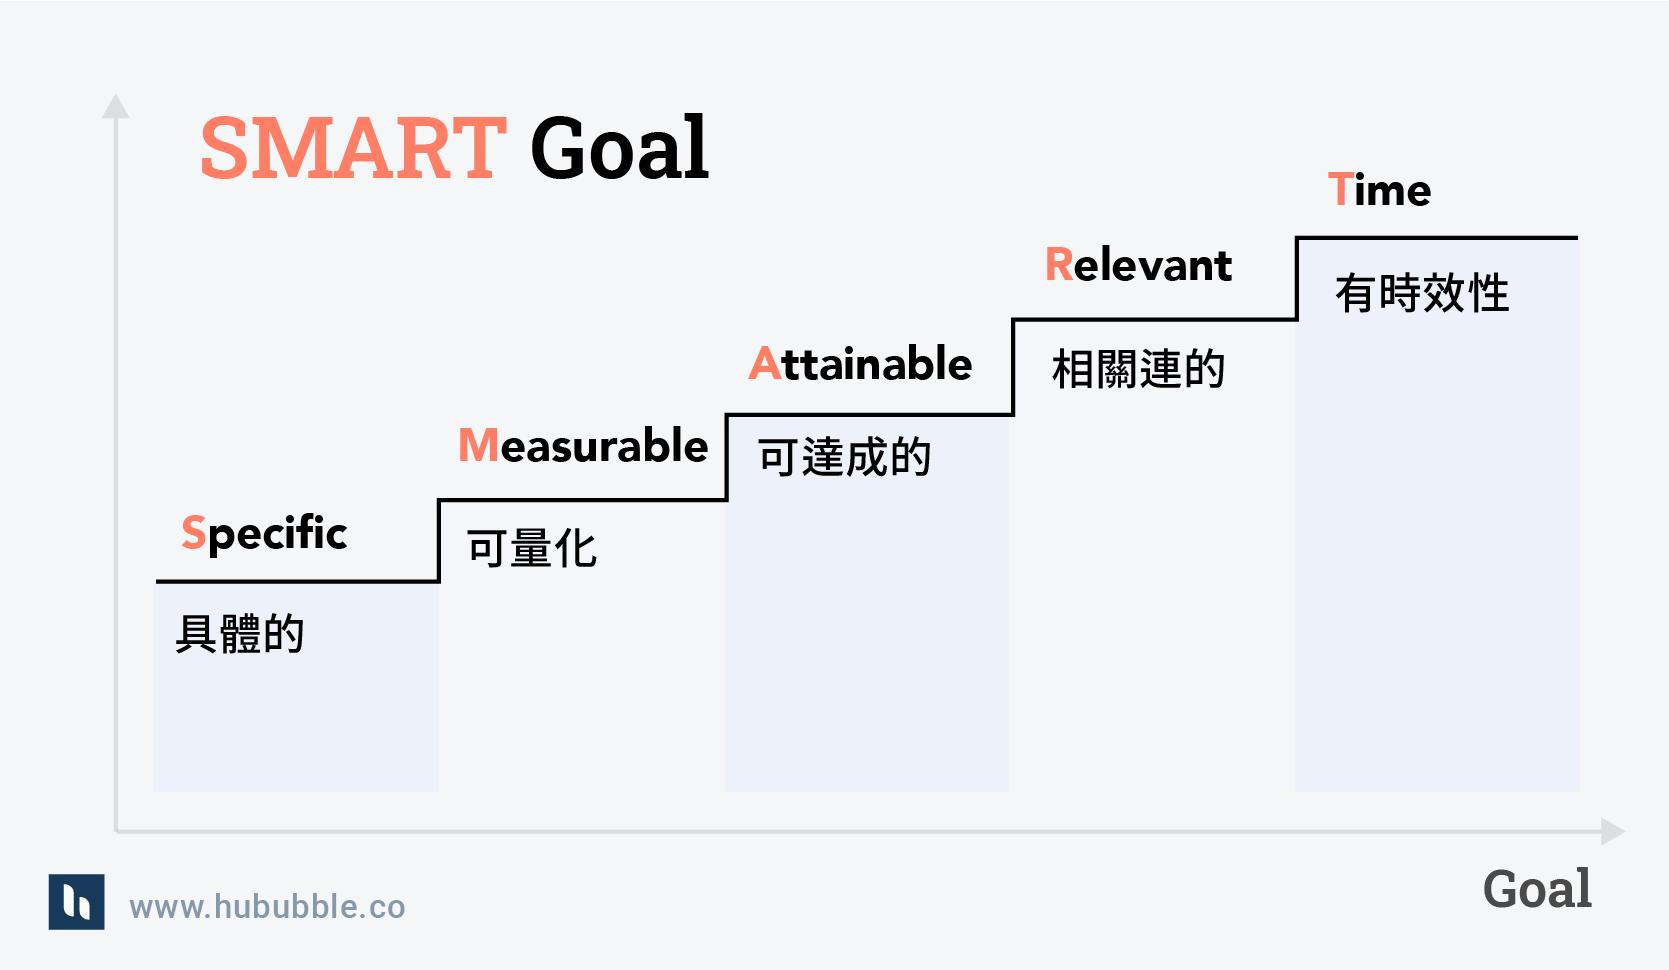 smart goal